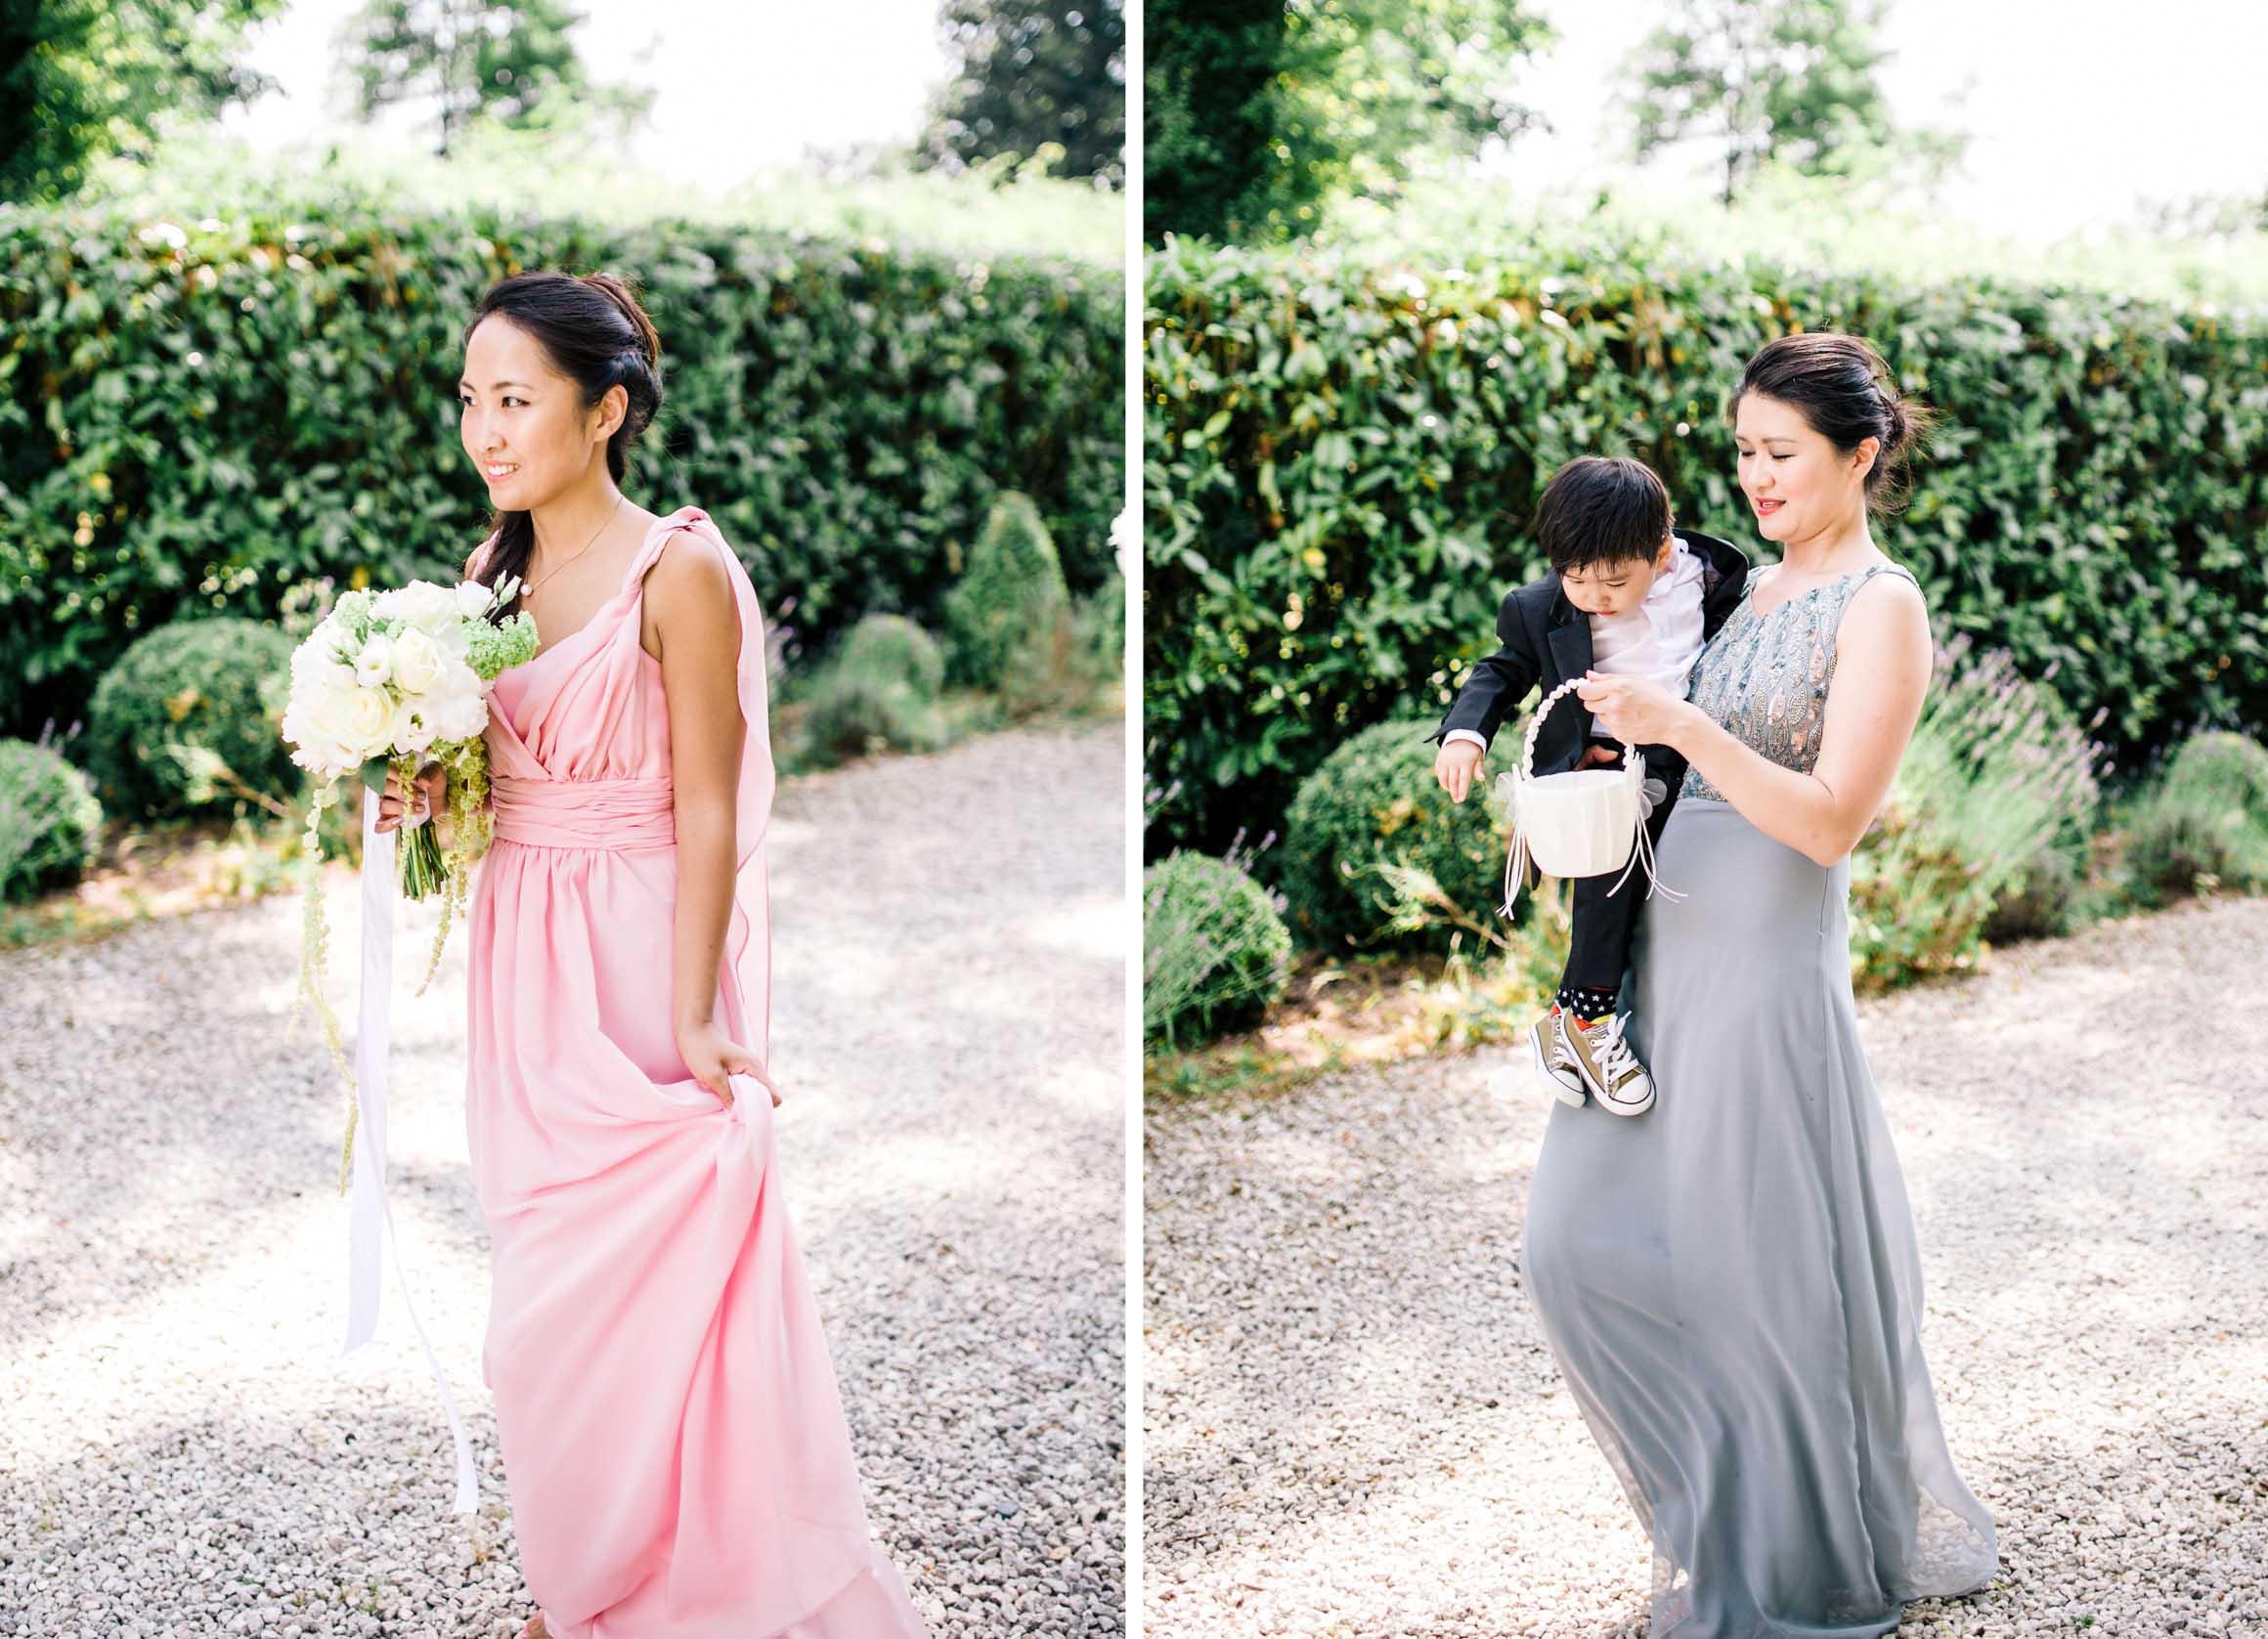 Amy O'Boyle Photography- Destination & UK Fine Art Film Wedding Photographer- Chateau La Durantie Wedding 15.jpg